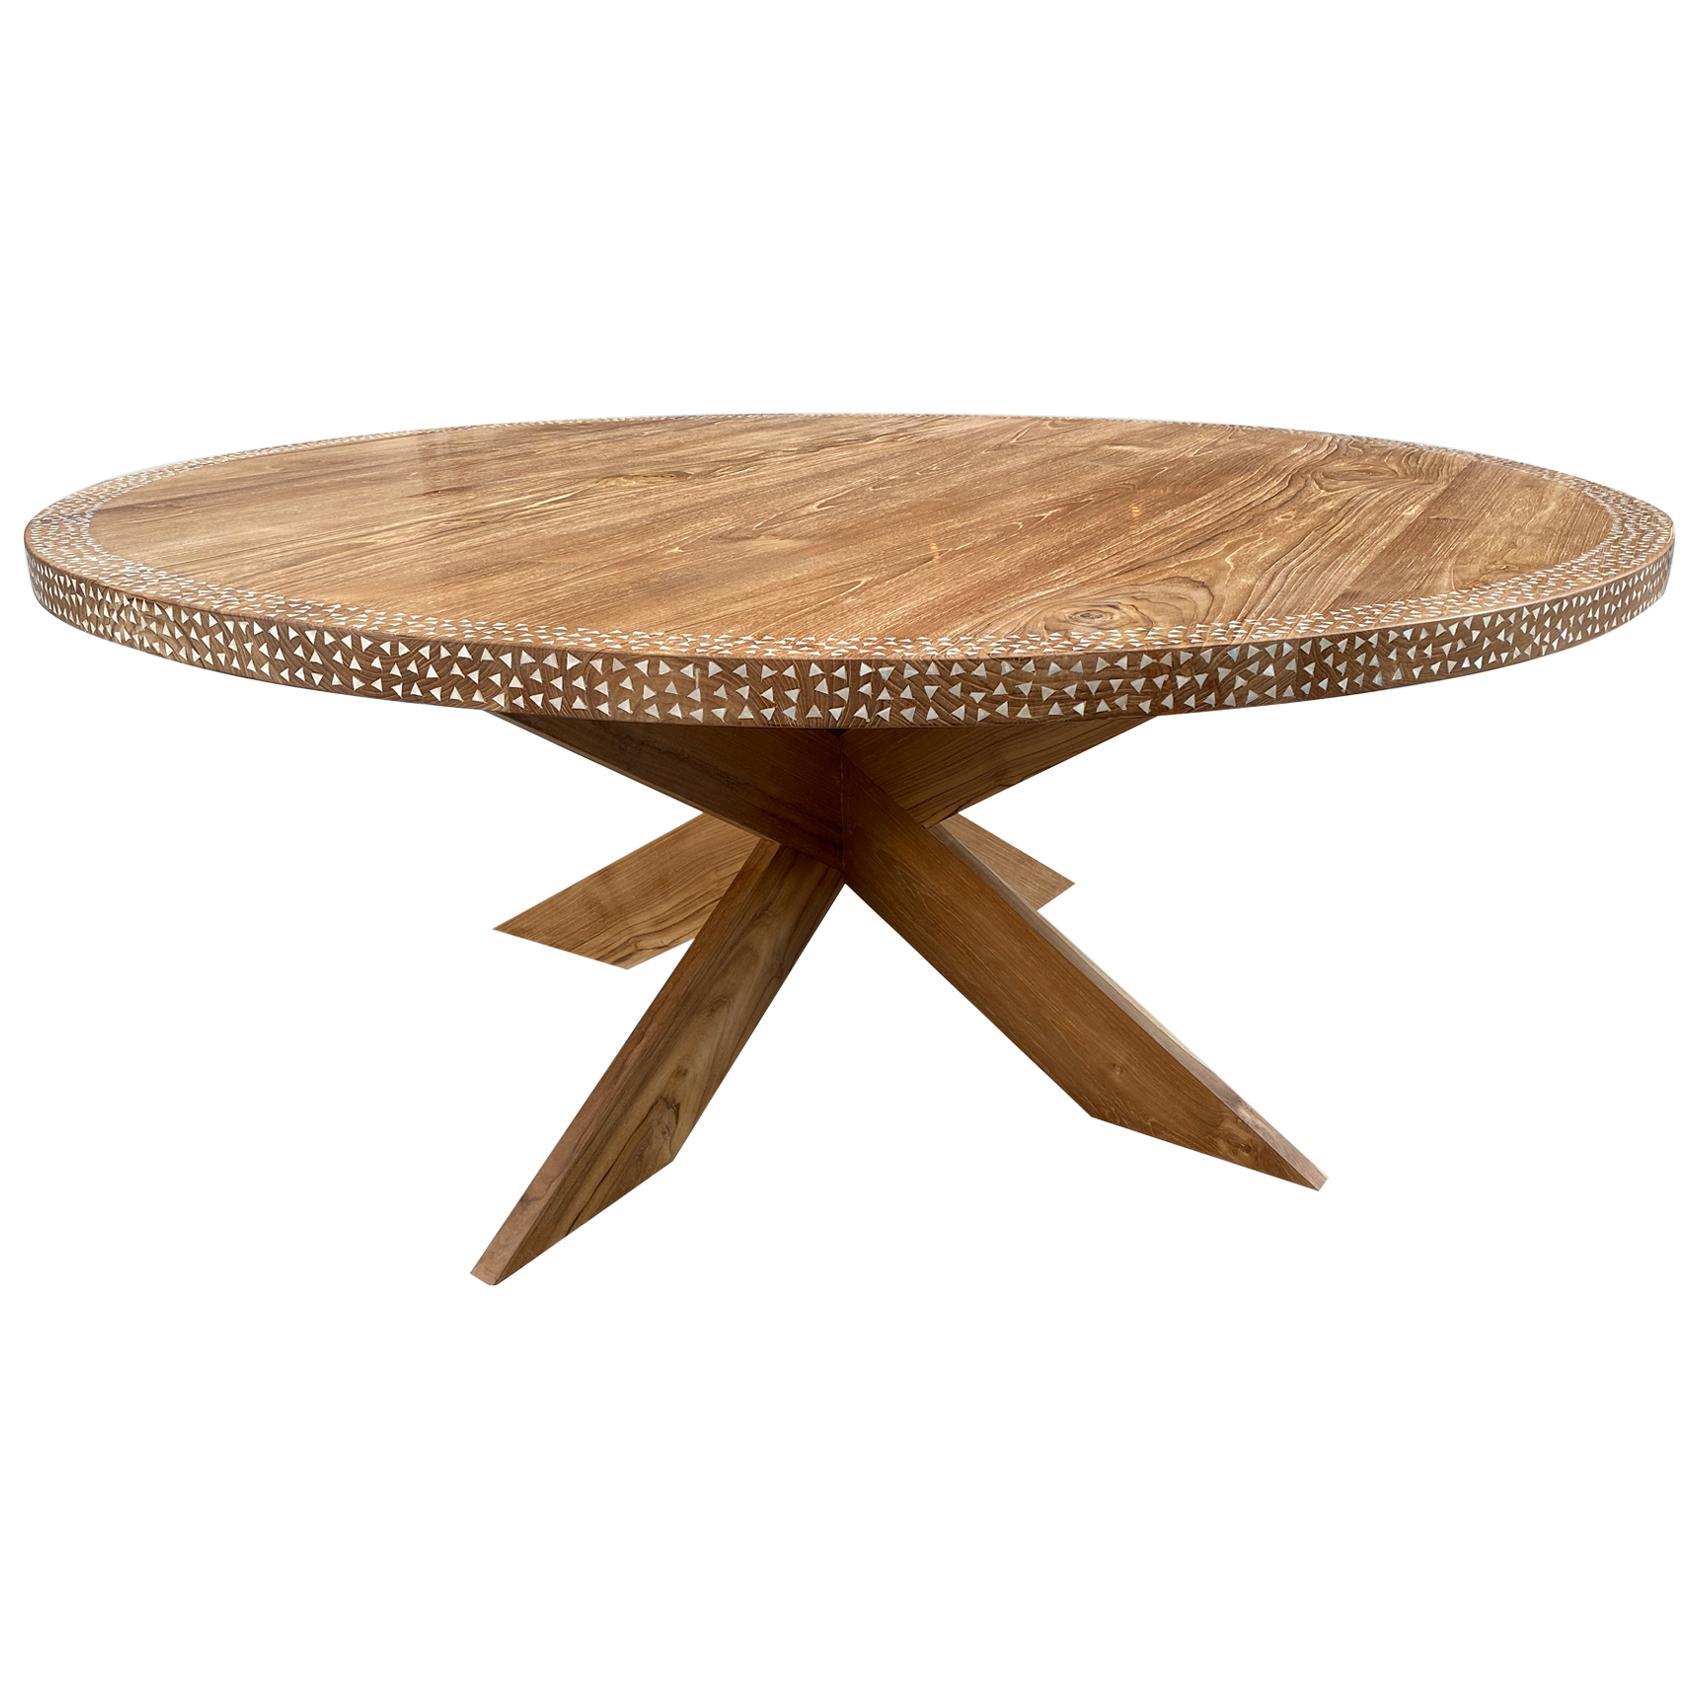 Andrianna Shamaris Round Shell Inlaid Teak Wood Dining Table